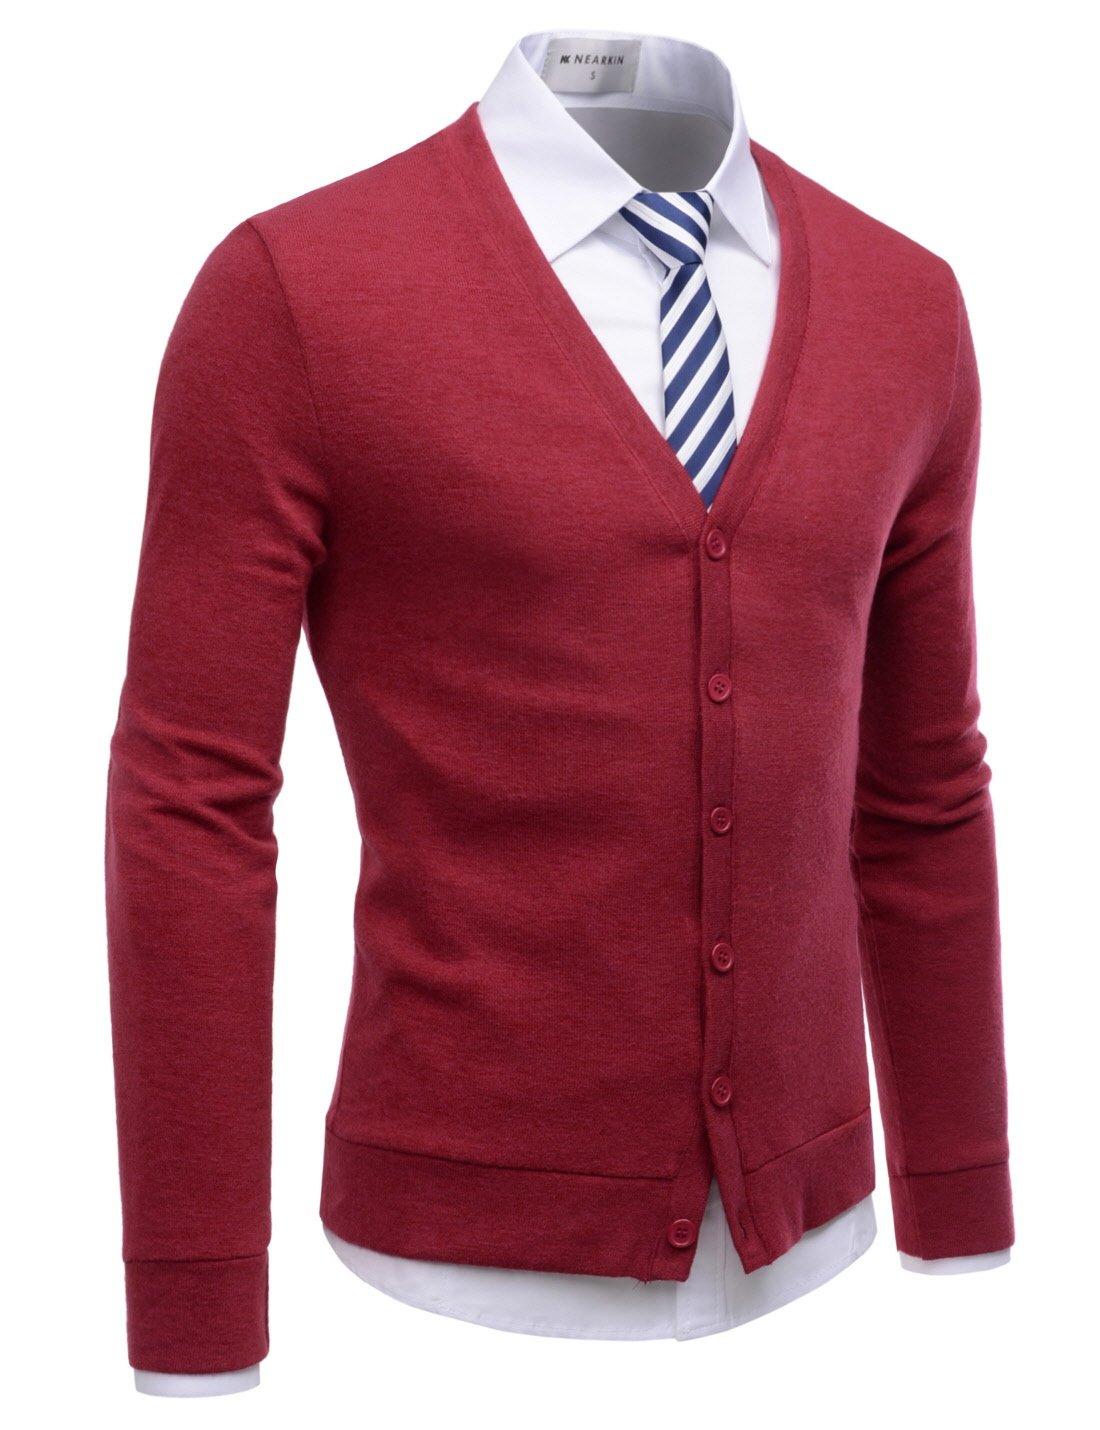 NEARKIN (NKNKCAC1) Mens Knitwear City Casual Slim Cut Long Sleeve Cardigan Sweaters RED US XL(Tag size XL) by NEARKIN